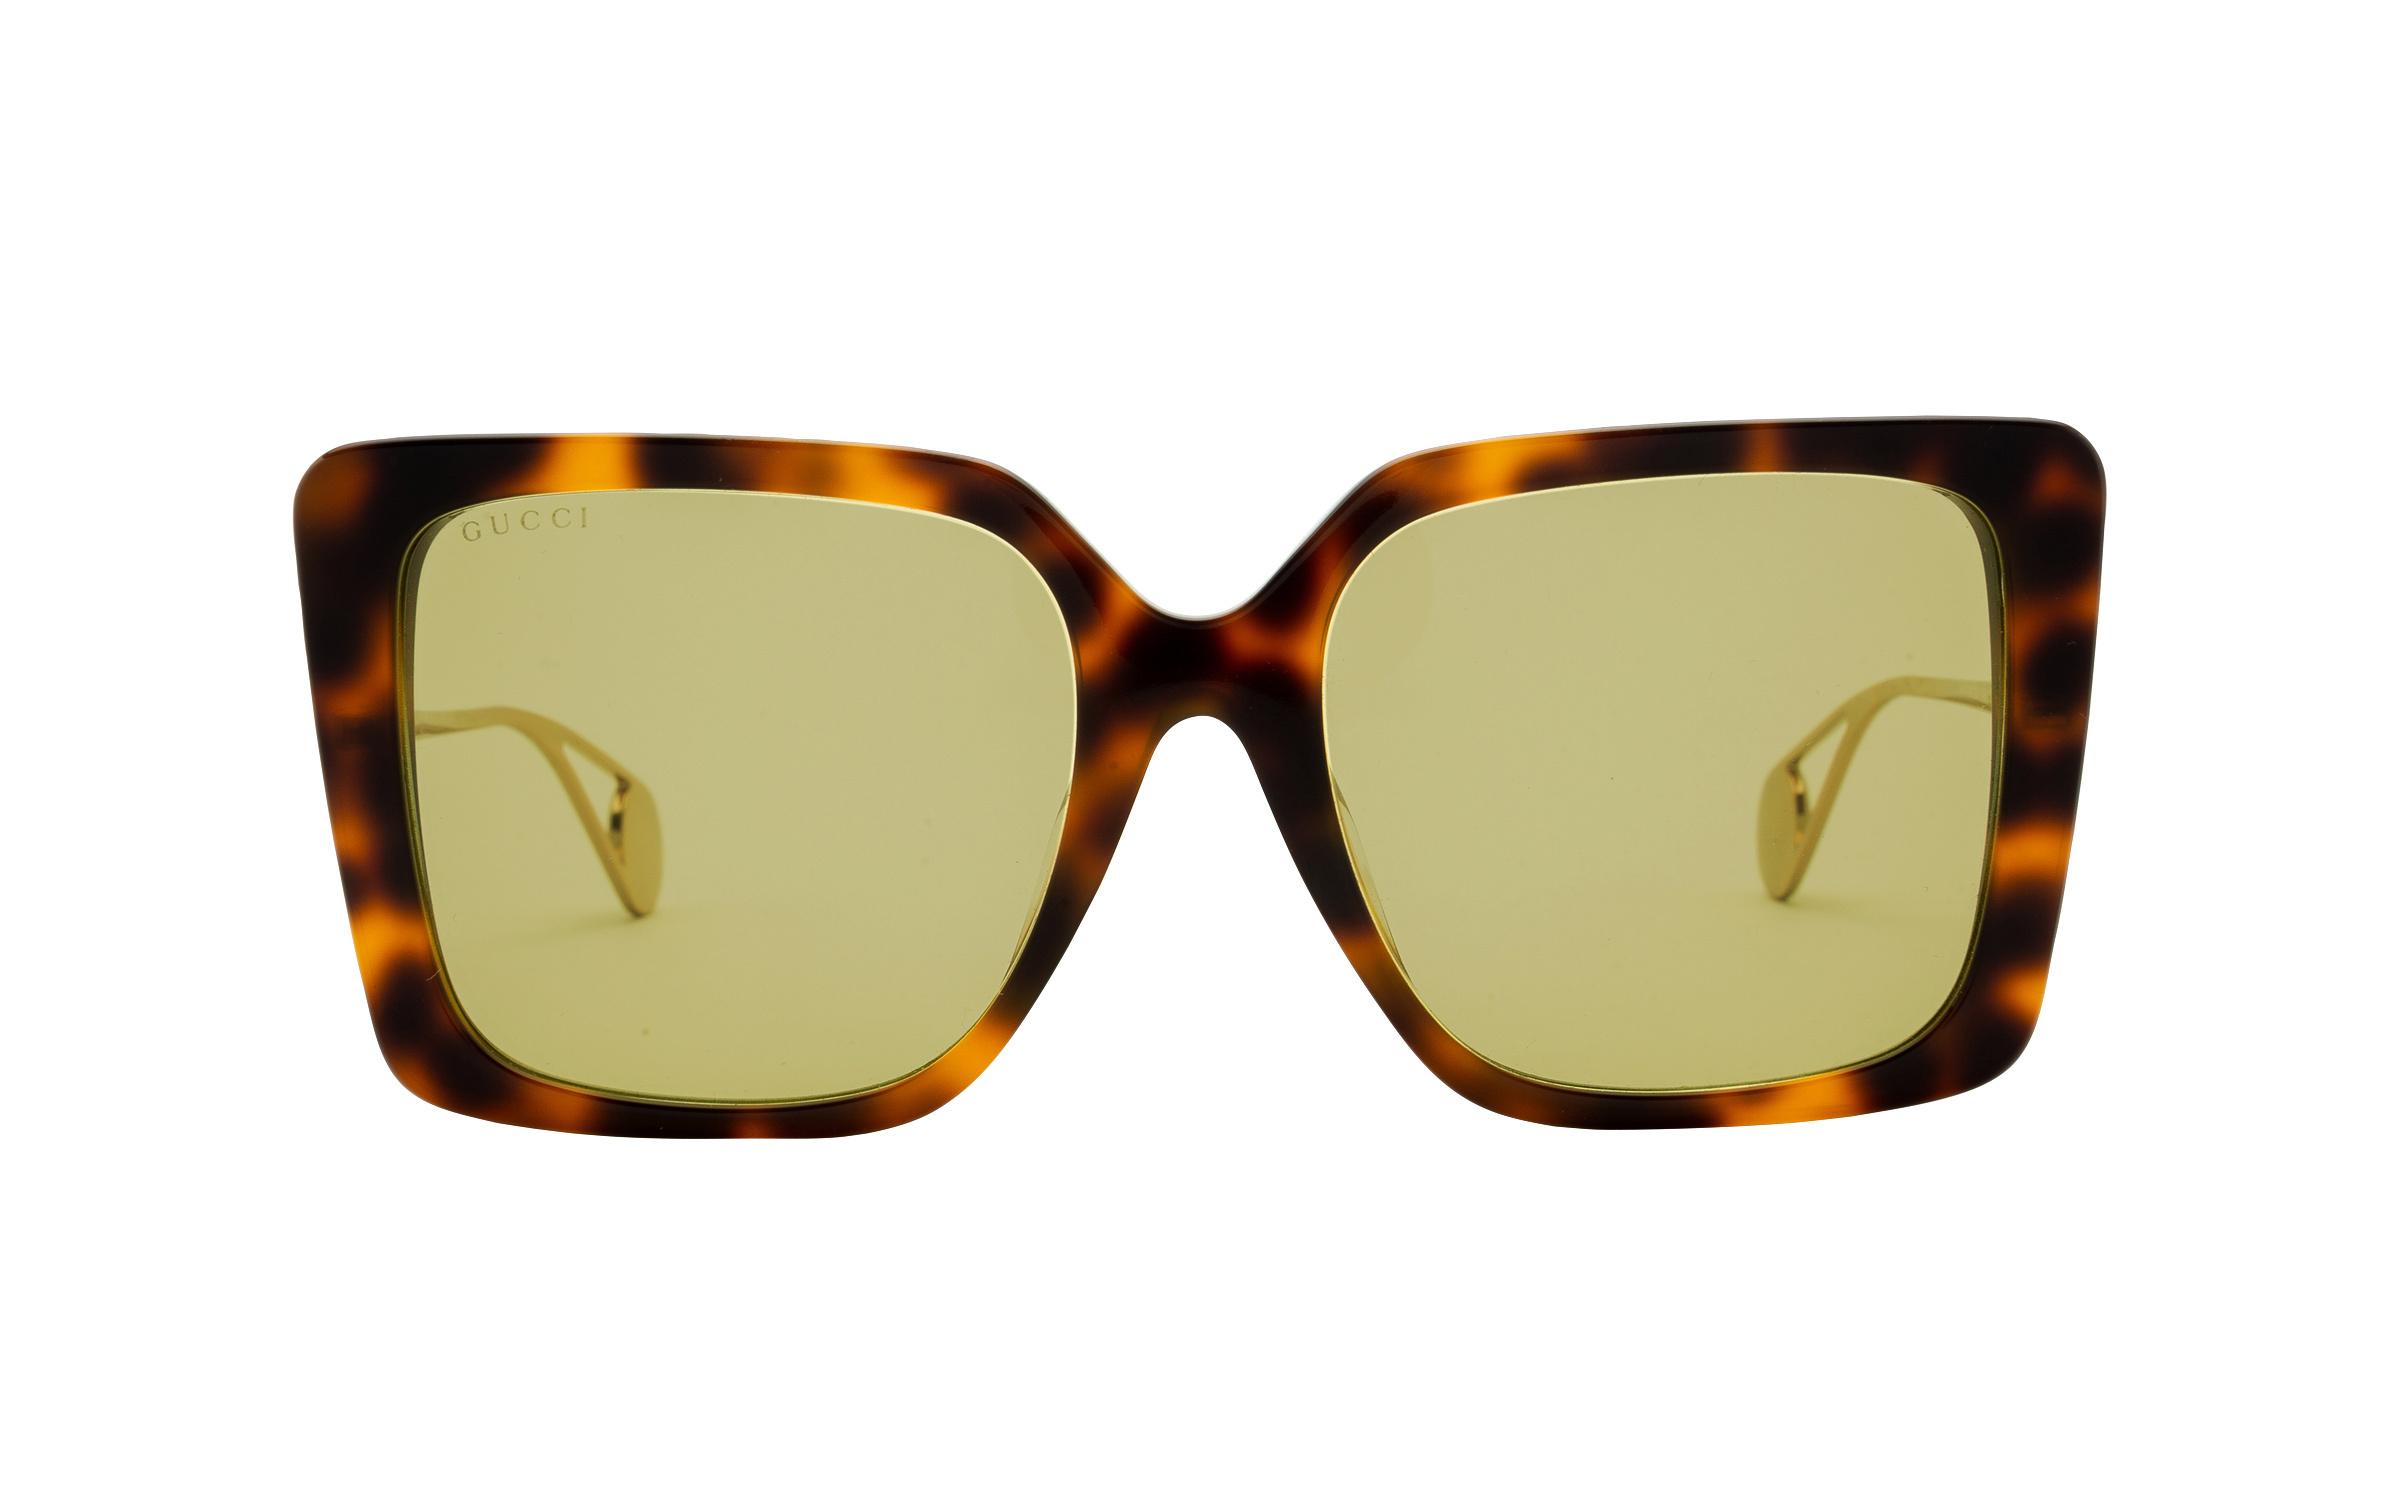 Gucci GG0435SA 002 54 Sunglasses in Havana Tortoise | Acetate